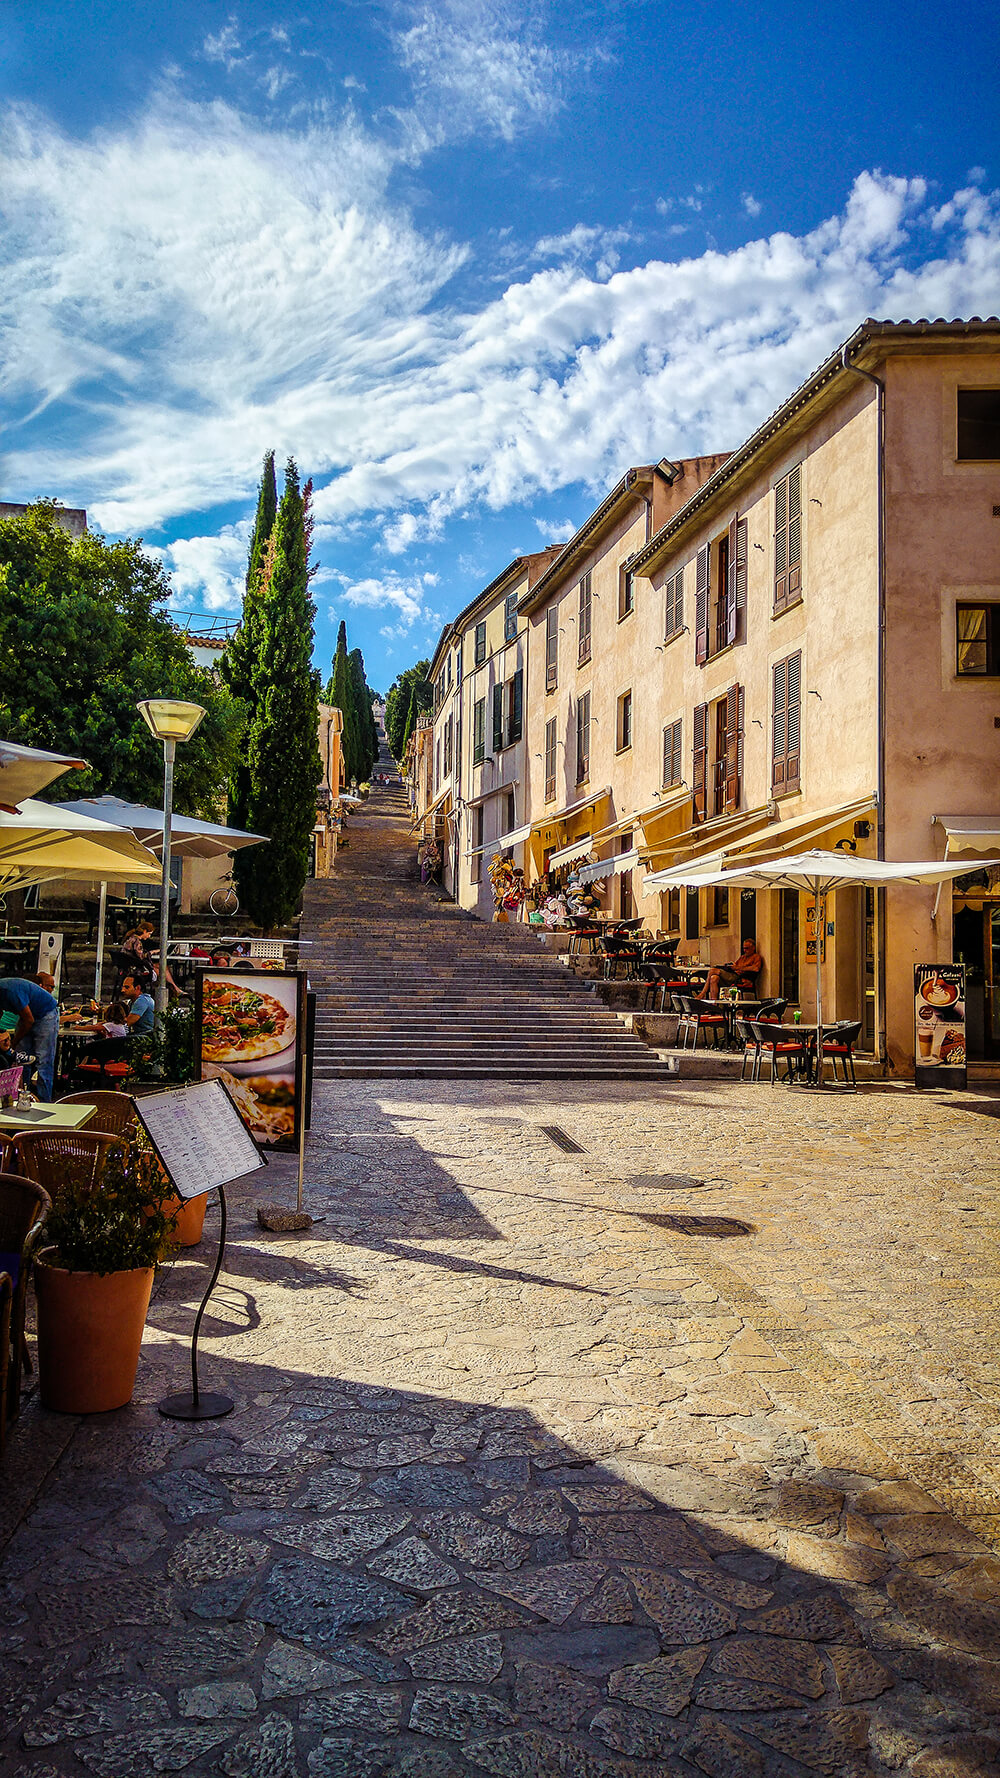 Mallorca-Pollenca-Treppe-Restaurant-Platz